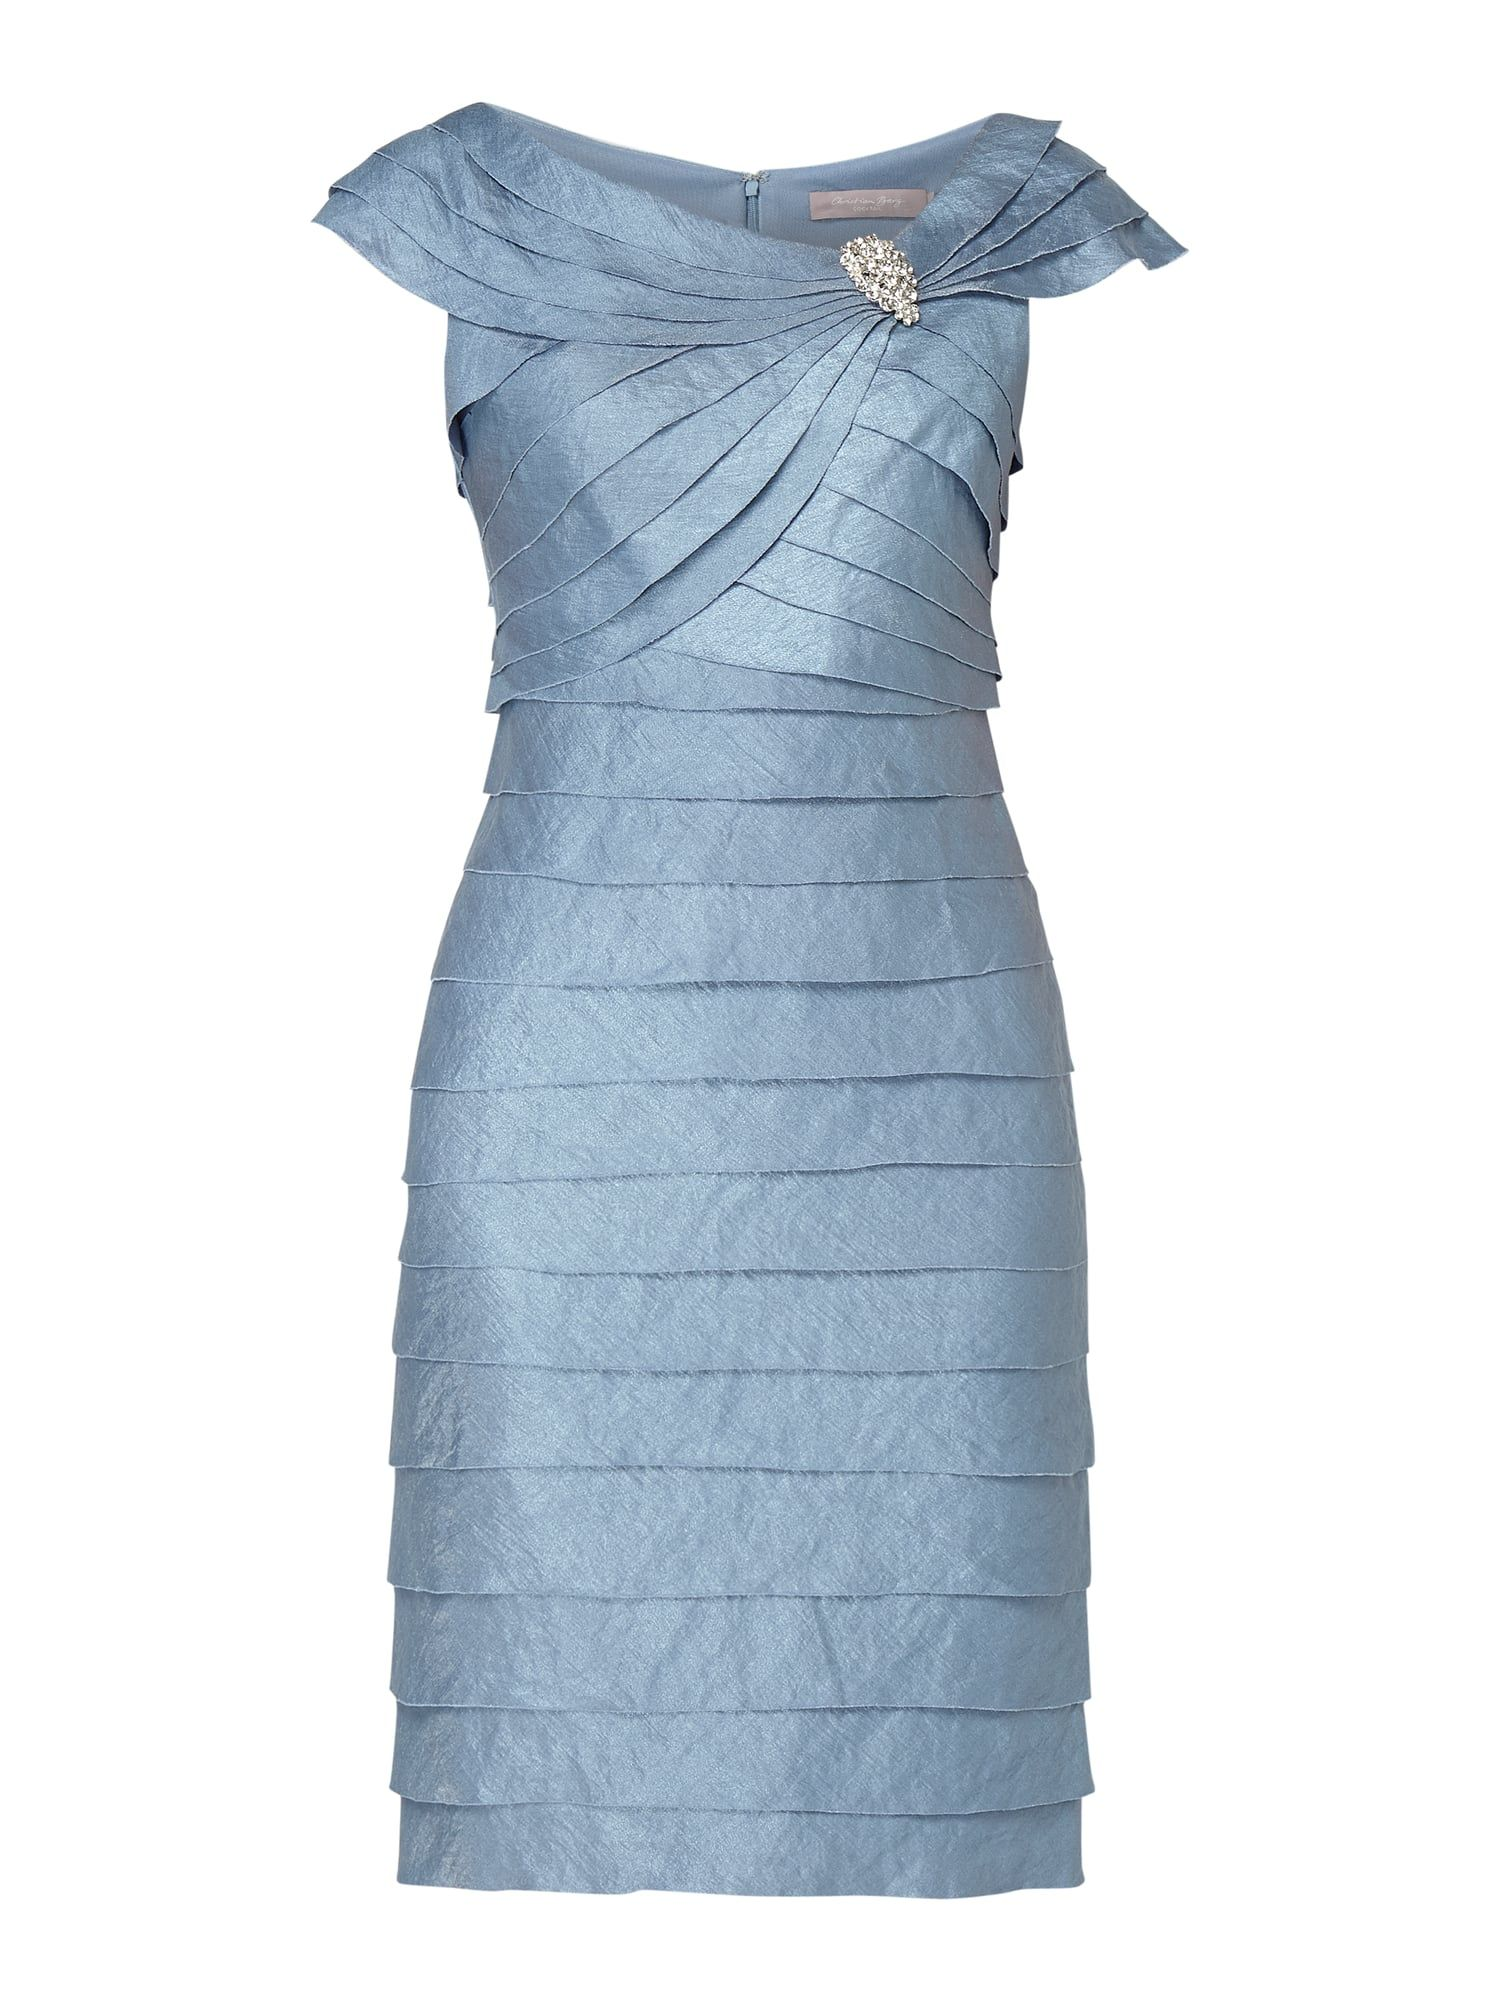 christian berg cocktailkleid blau lang | fashion, formal